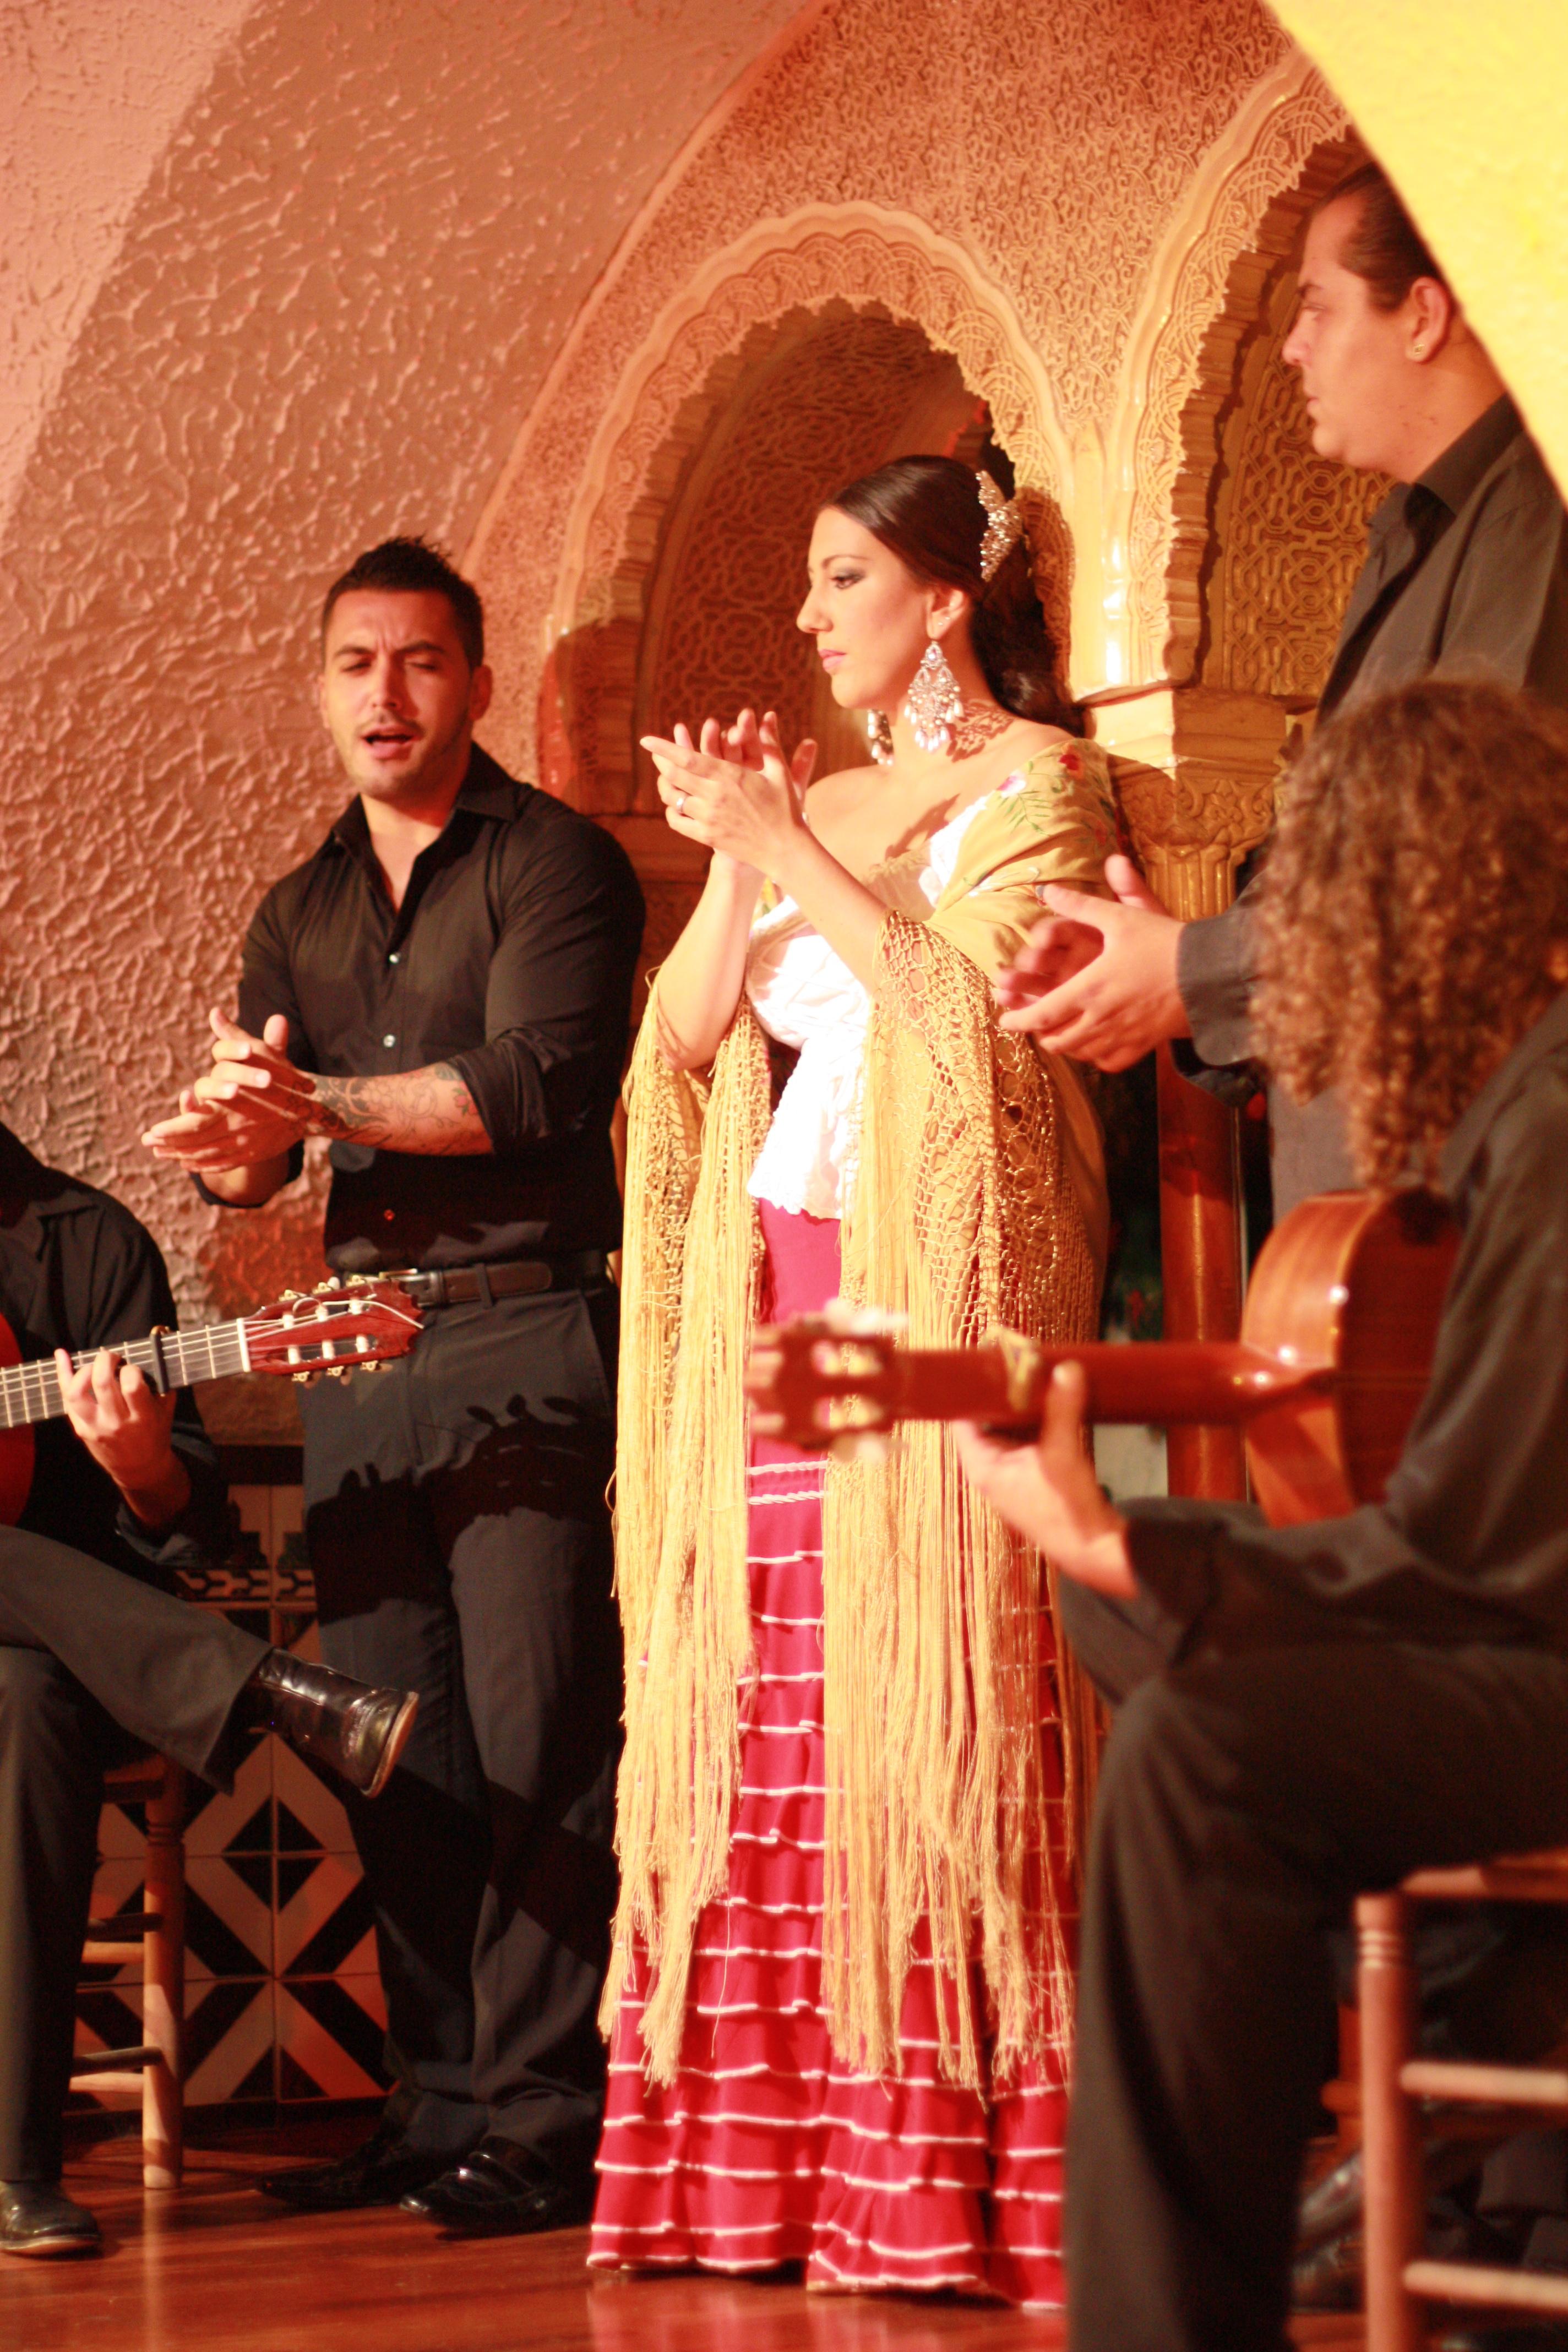 spain u2013 flamenco dancing gypsy family travel